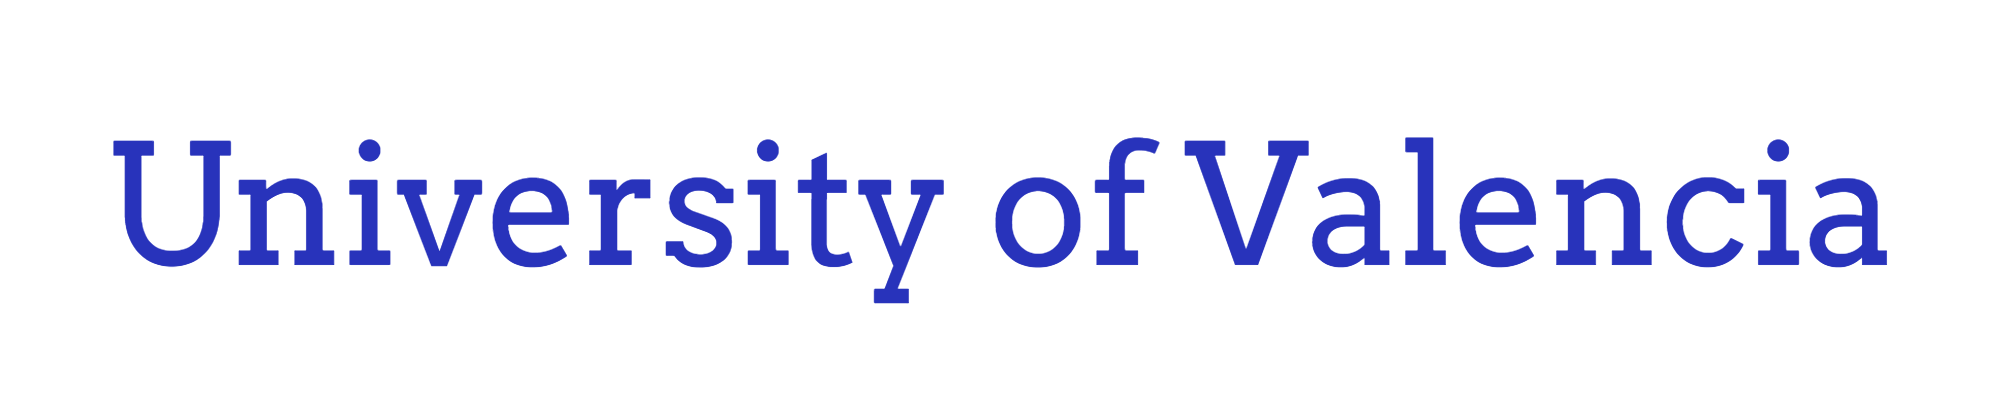 University of Valencia-logo.png